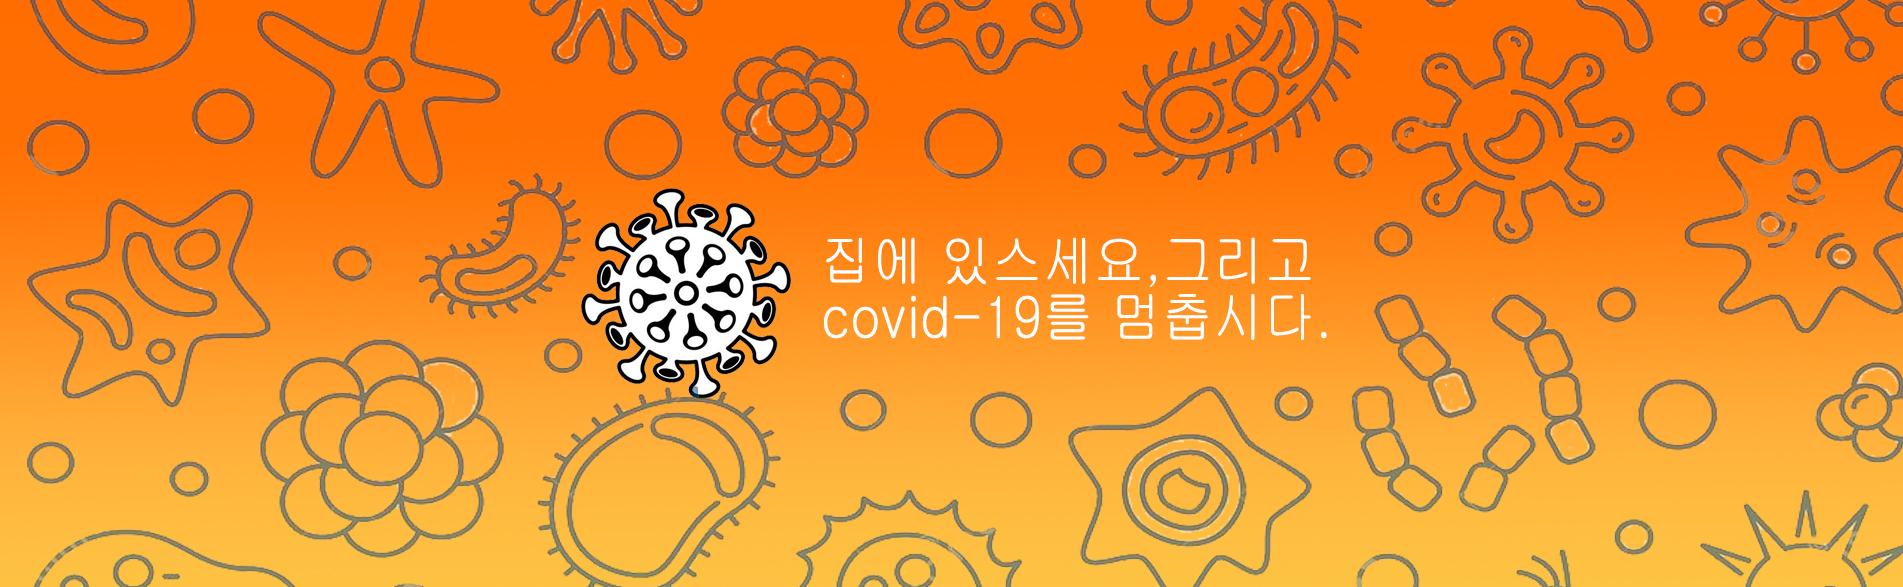 poster wix 한국어